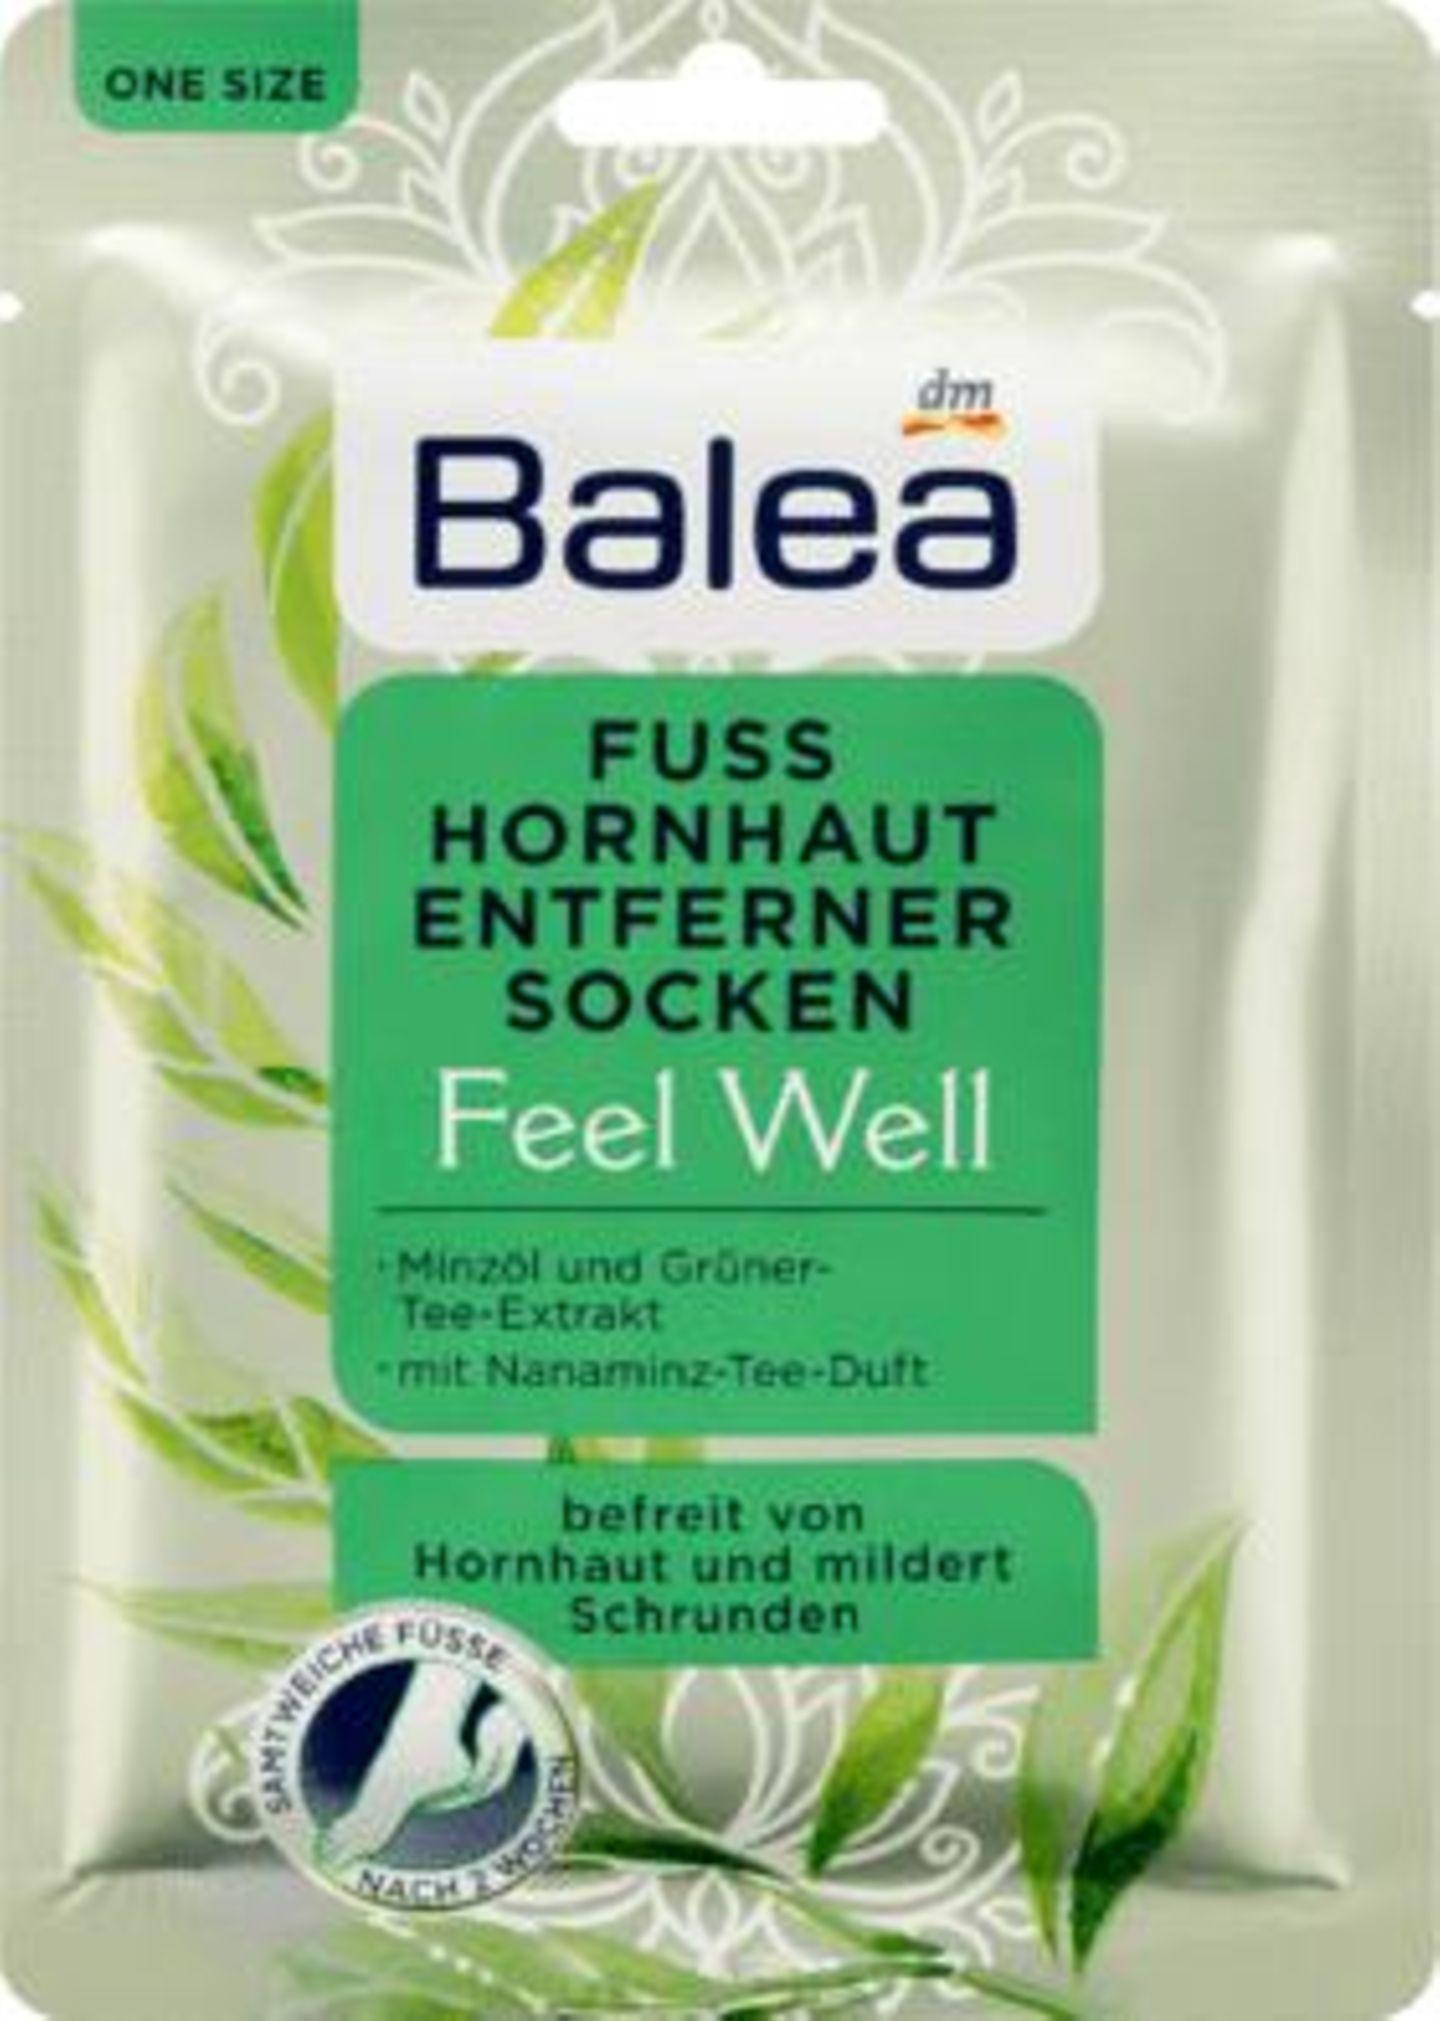 Balea Fuß Hornhaut Entferner Socken